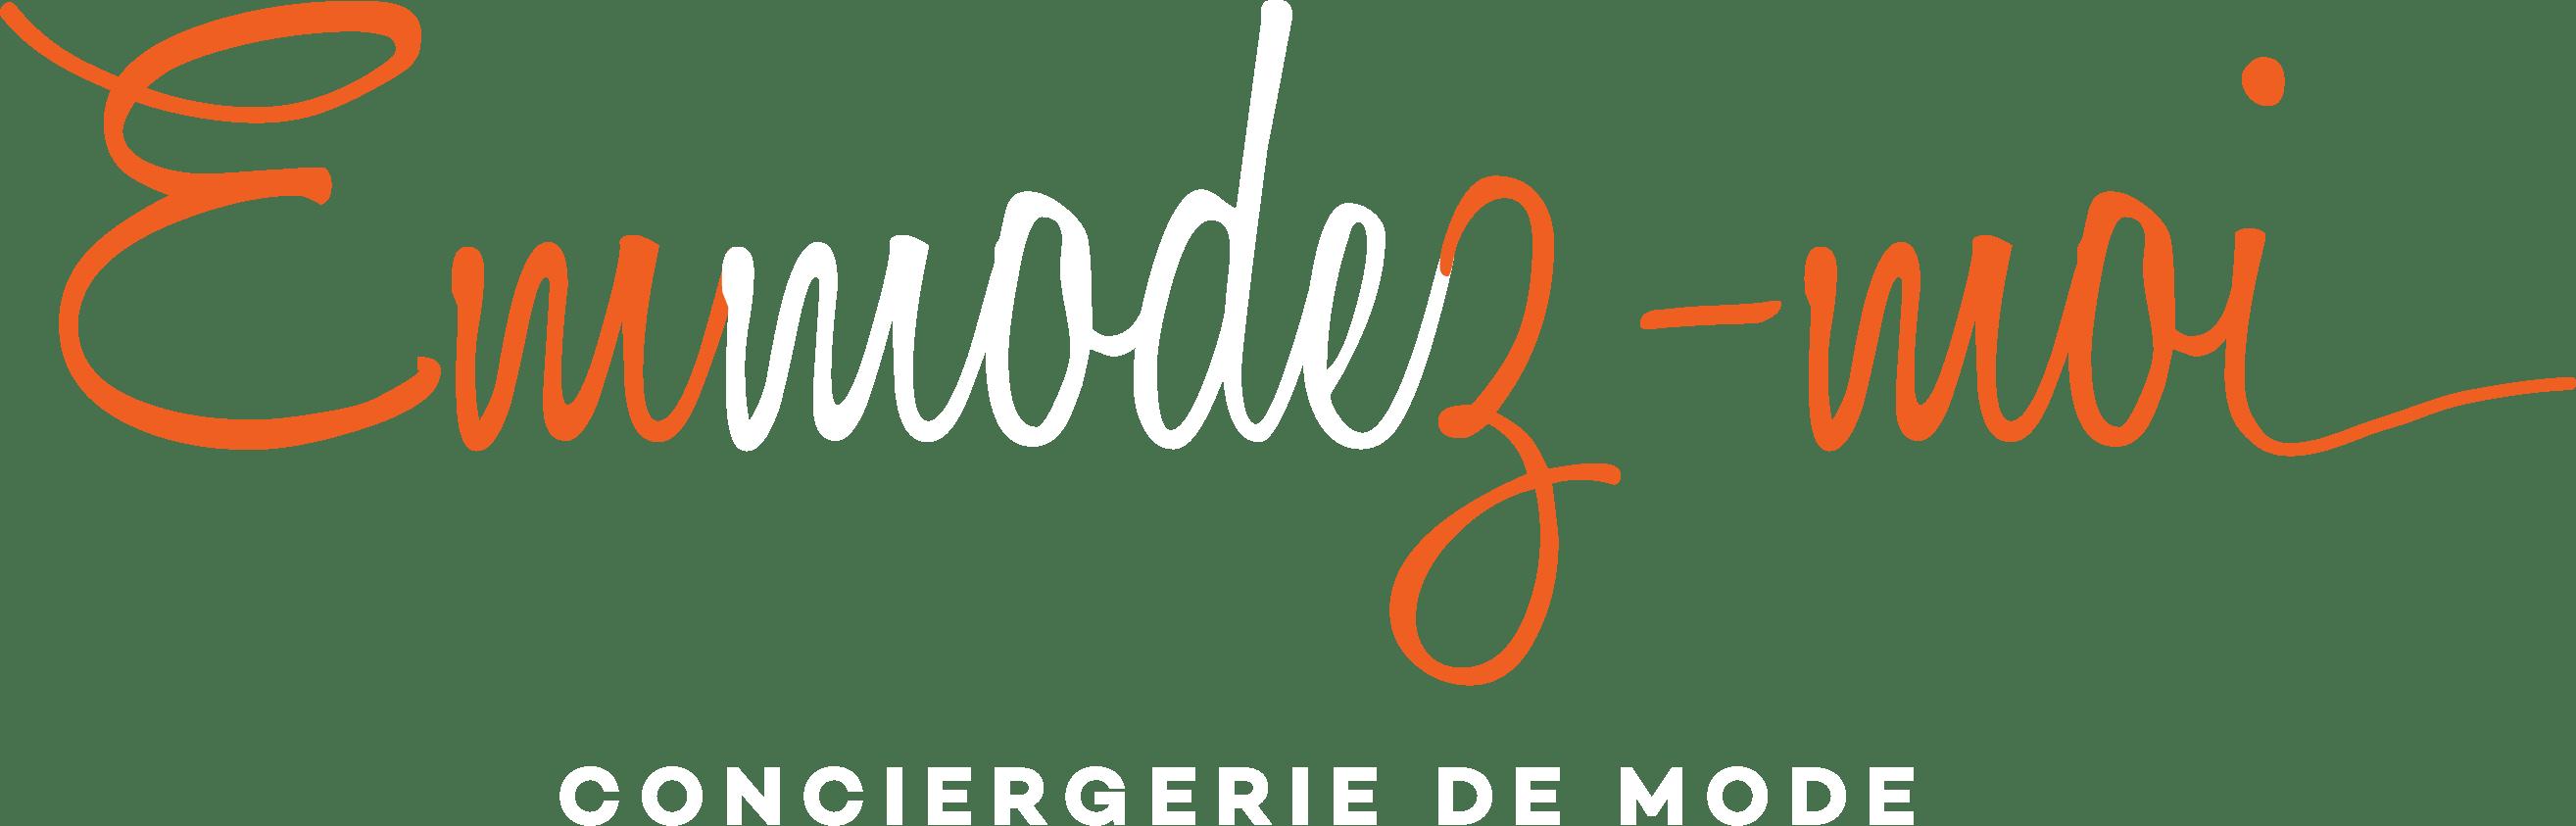 Logo footer Emmodez-moi, conciergerie de mode à Lyon, Stylisme, Personal Shopping, Conseil en Image, Circuit mode Lyon